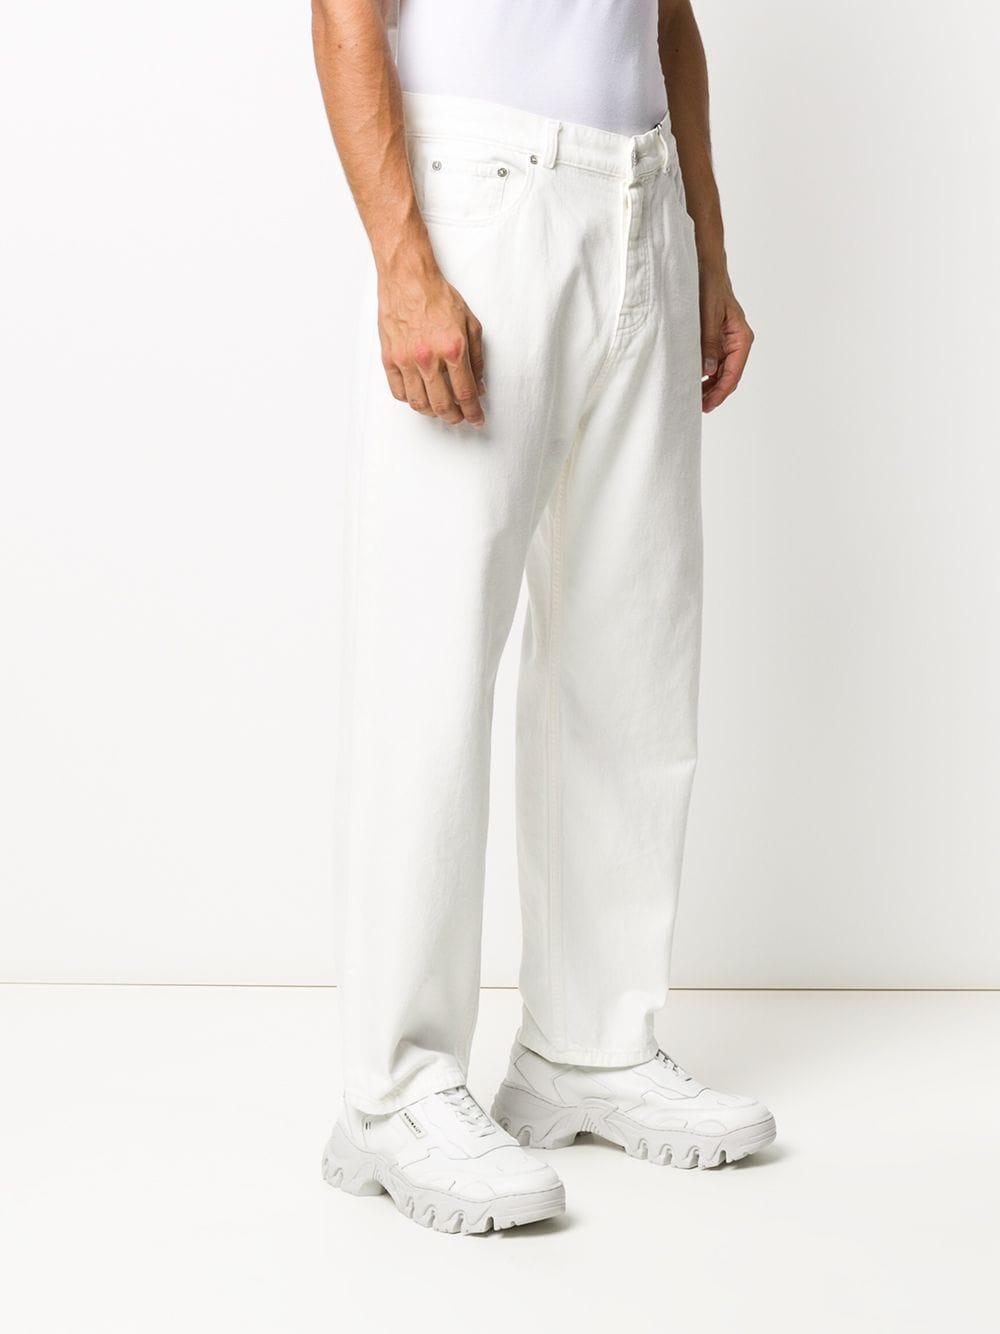 TOM WOOD TOM WOOD | Jeans | 40608064